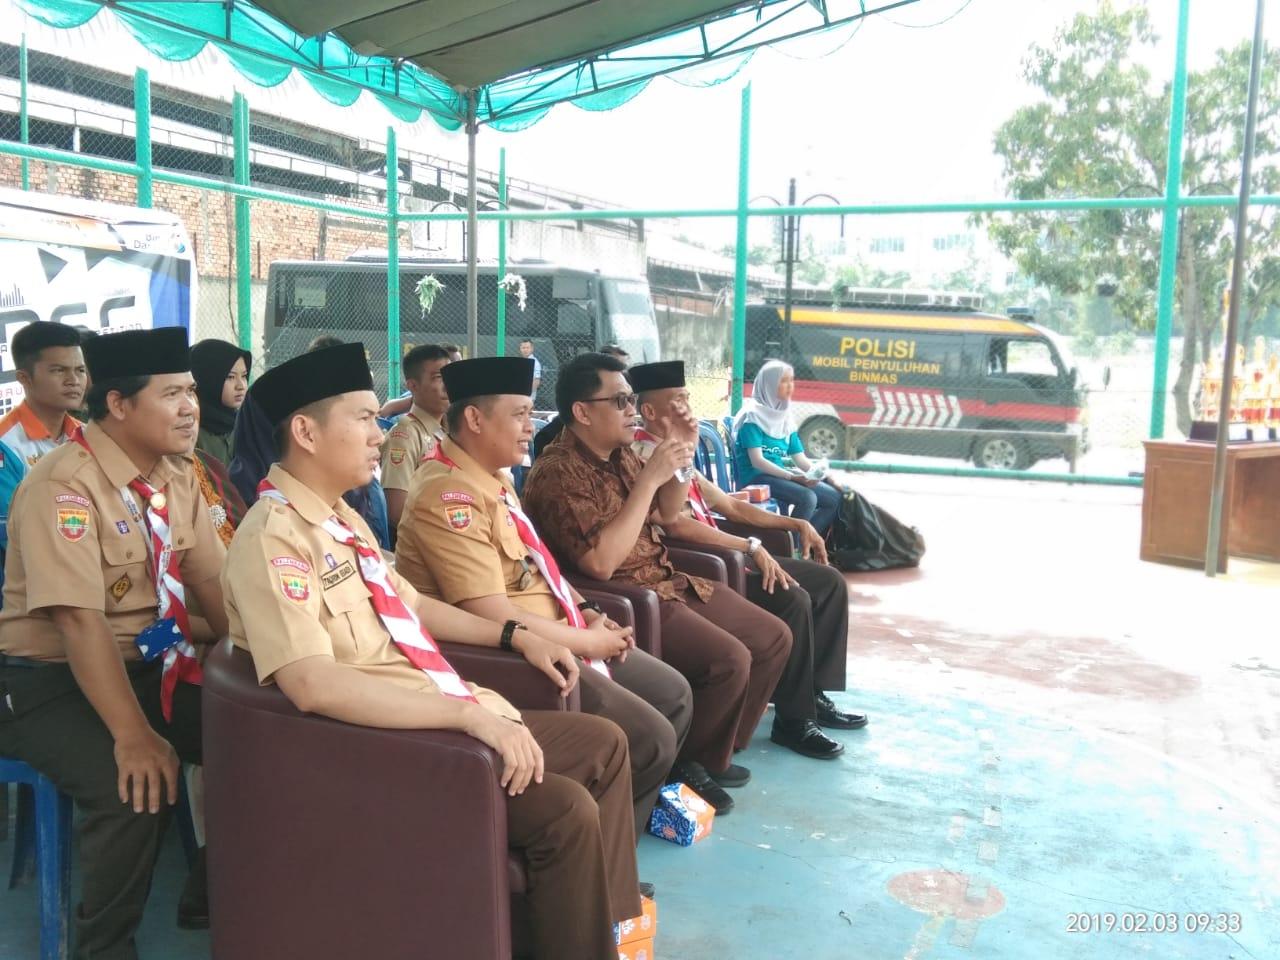 Wakil Rektor 1 Universitas Bina Darma Membuka Acara Bina Darma Scout Competiton 2019